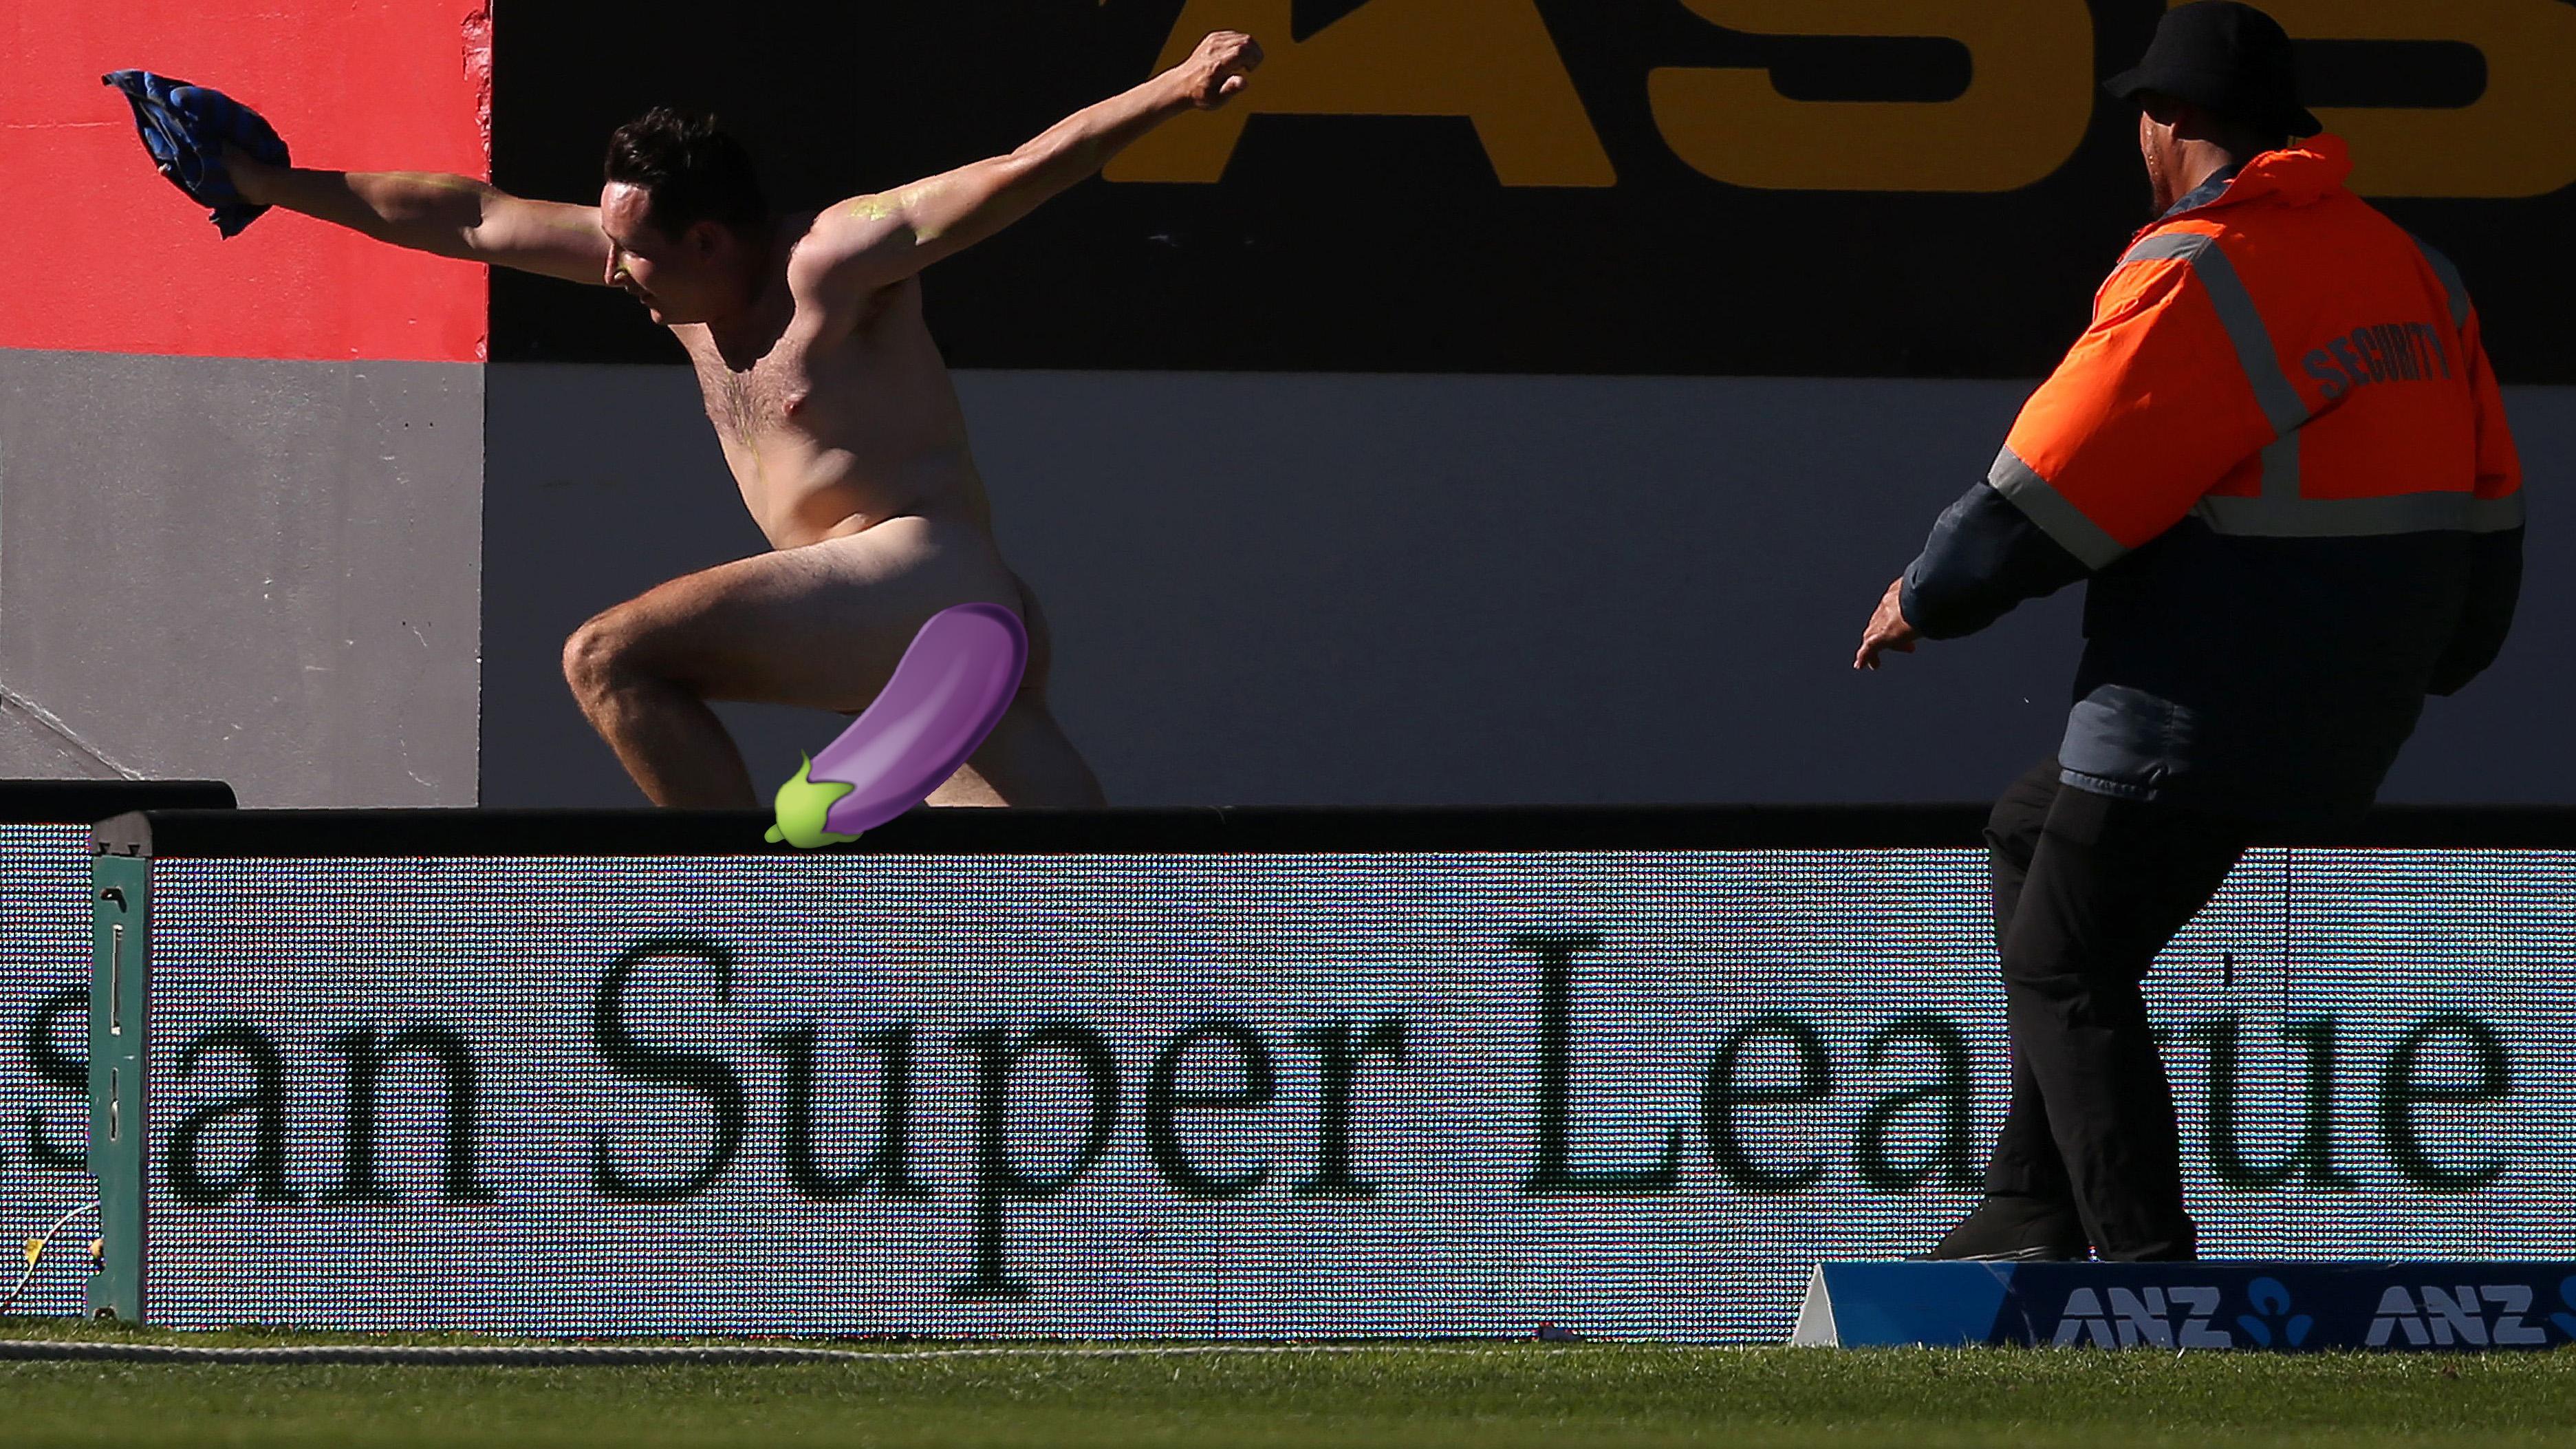 Usas scoreless draw vs serbia offers glimpse into arenas preferences foxsports com - Video Cricket Streaker S Near